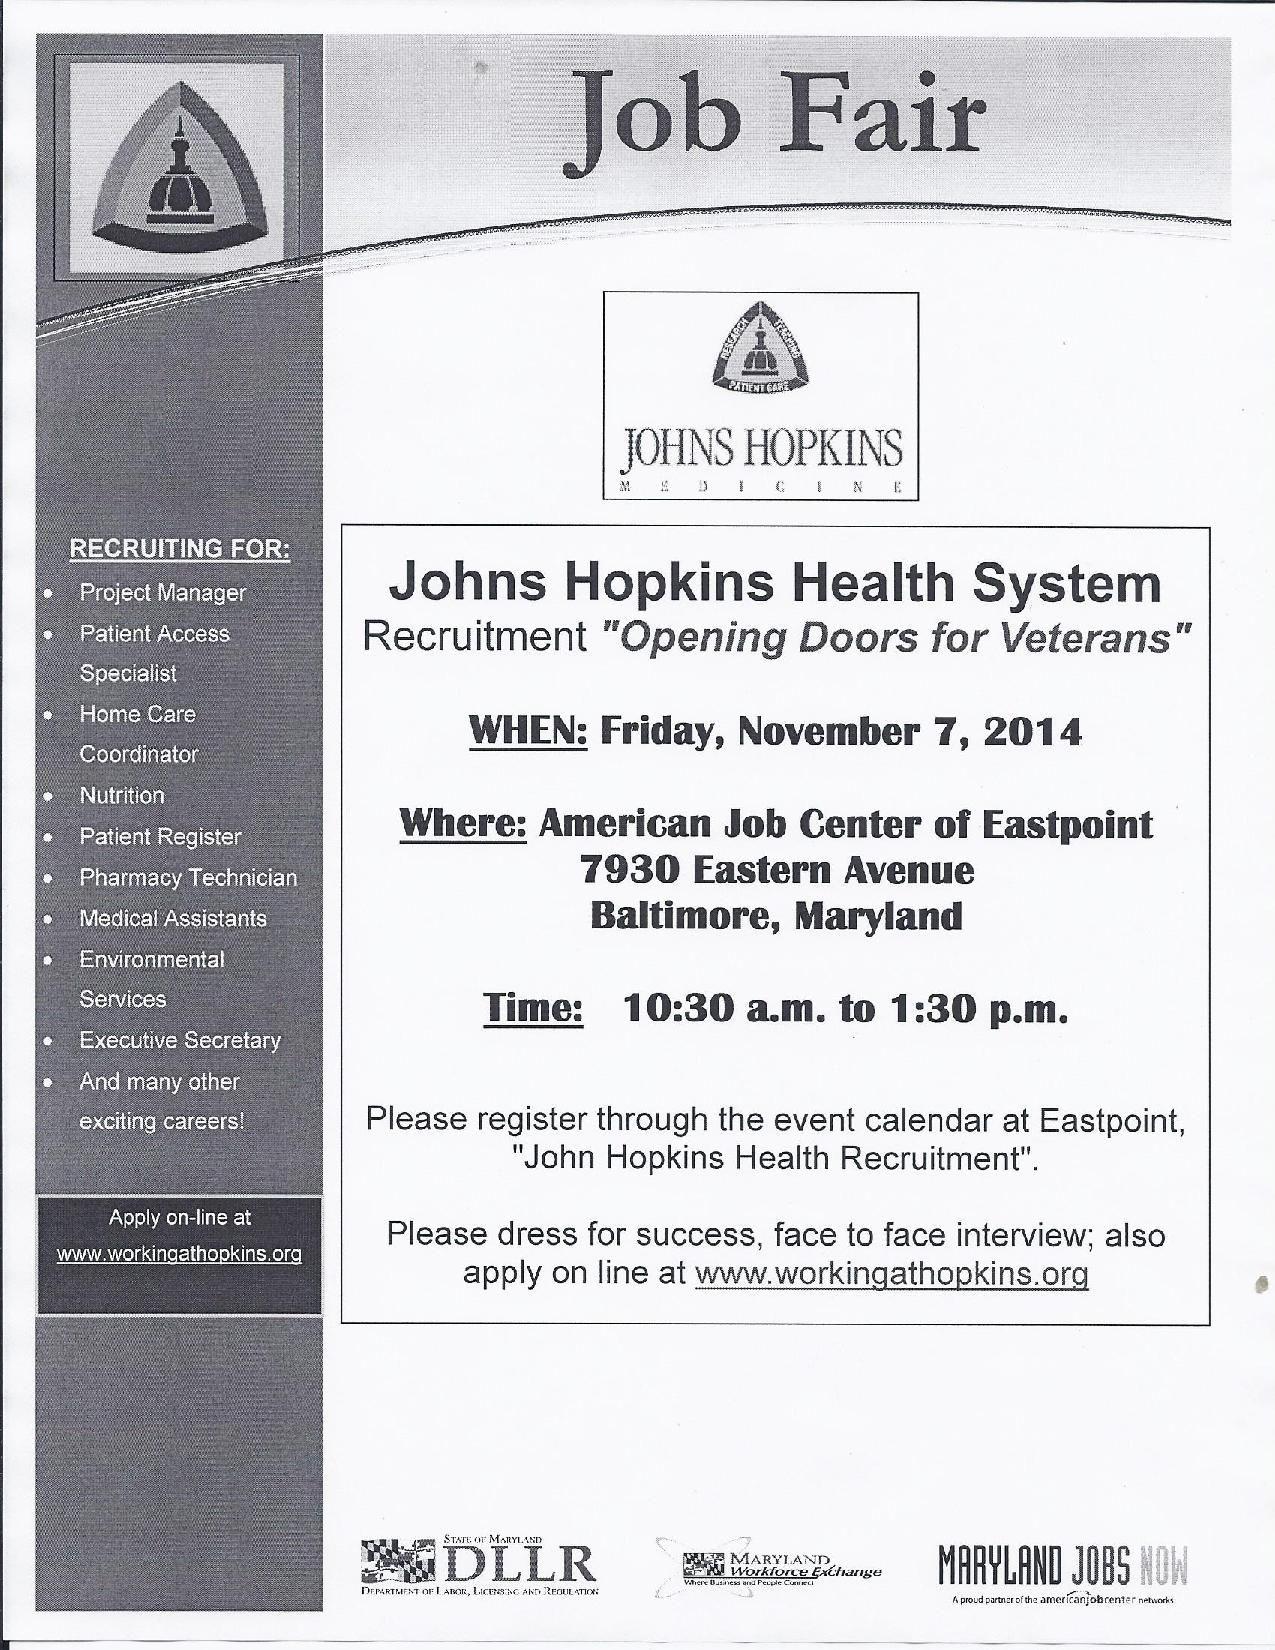 Johns Hopkins Health Systems will be hosting a Job Fair